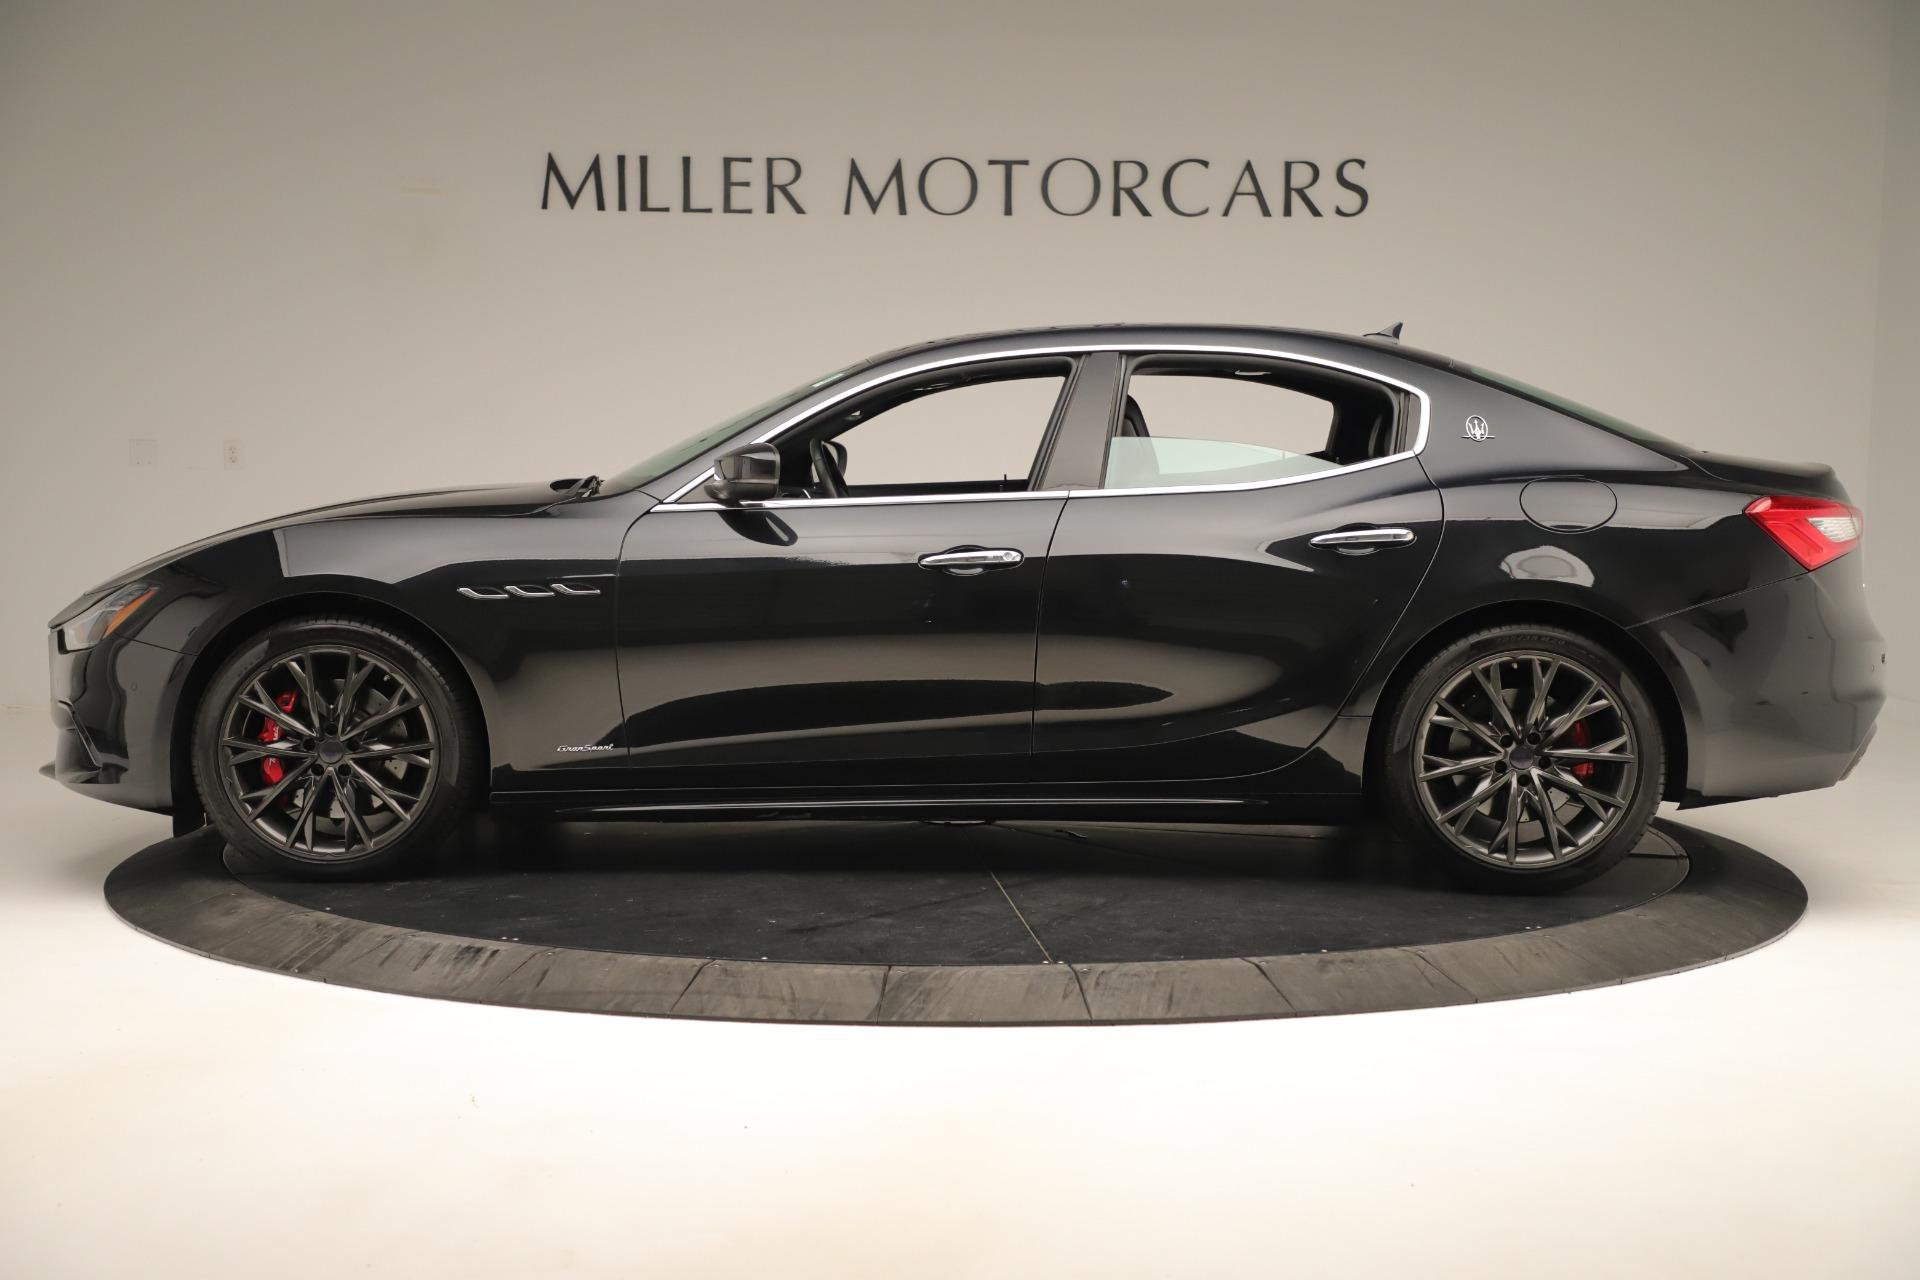 New 2019 Maserati Ghibli S Q4 GranSport For Sale In Greenwich, CT 2640_p3